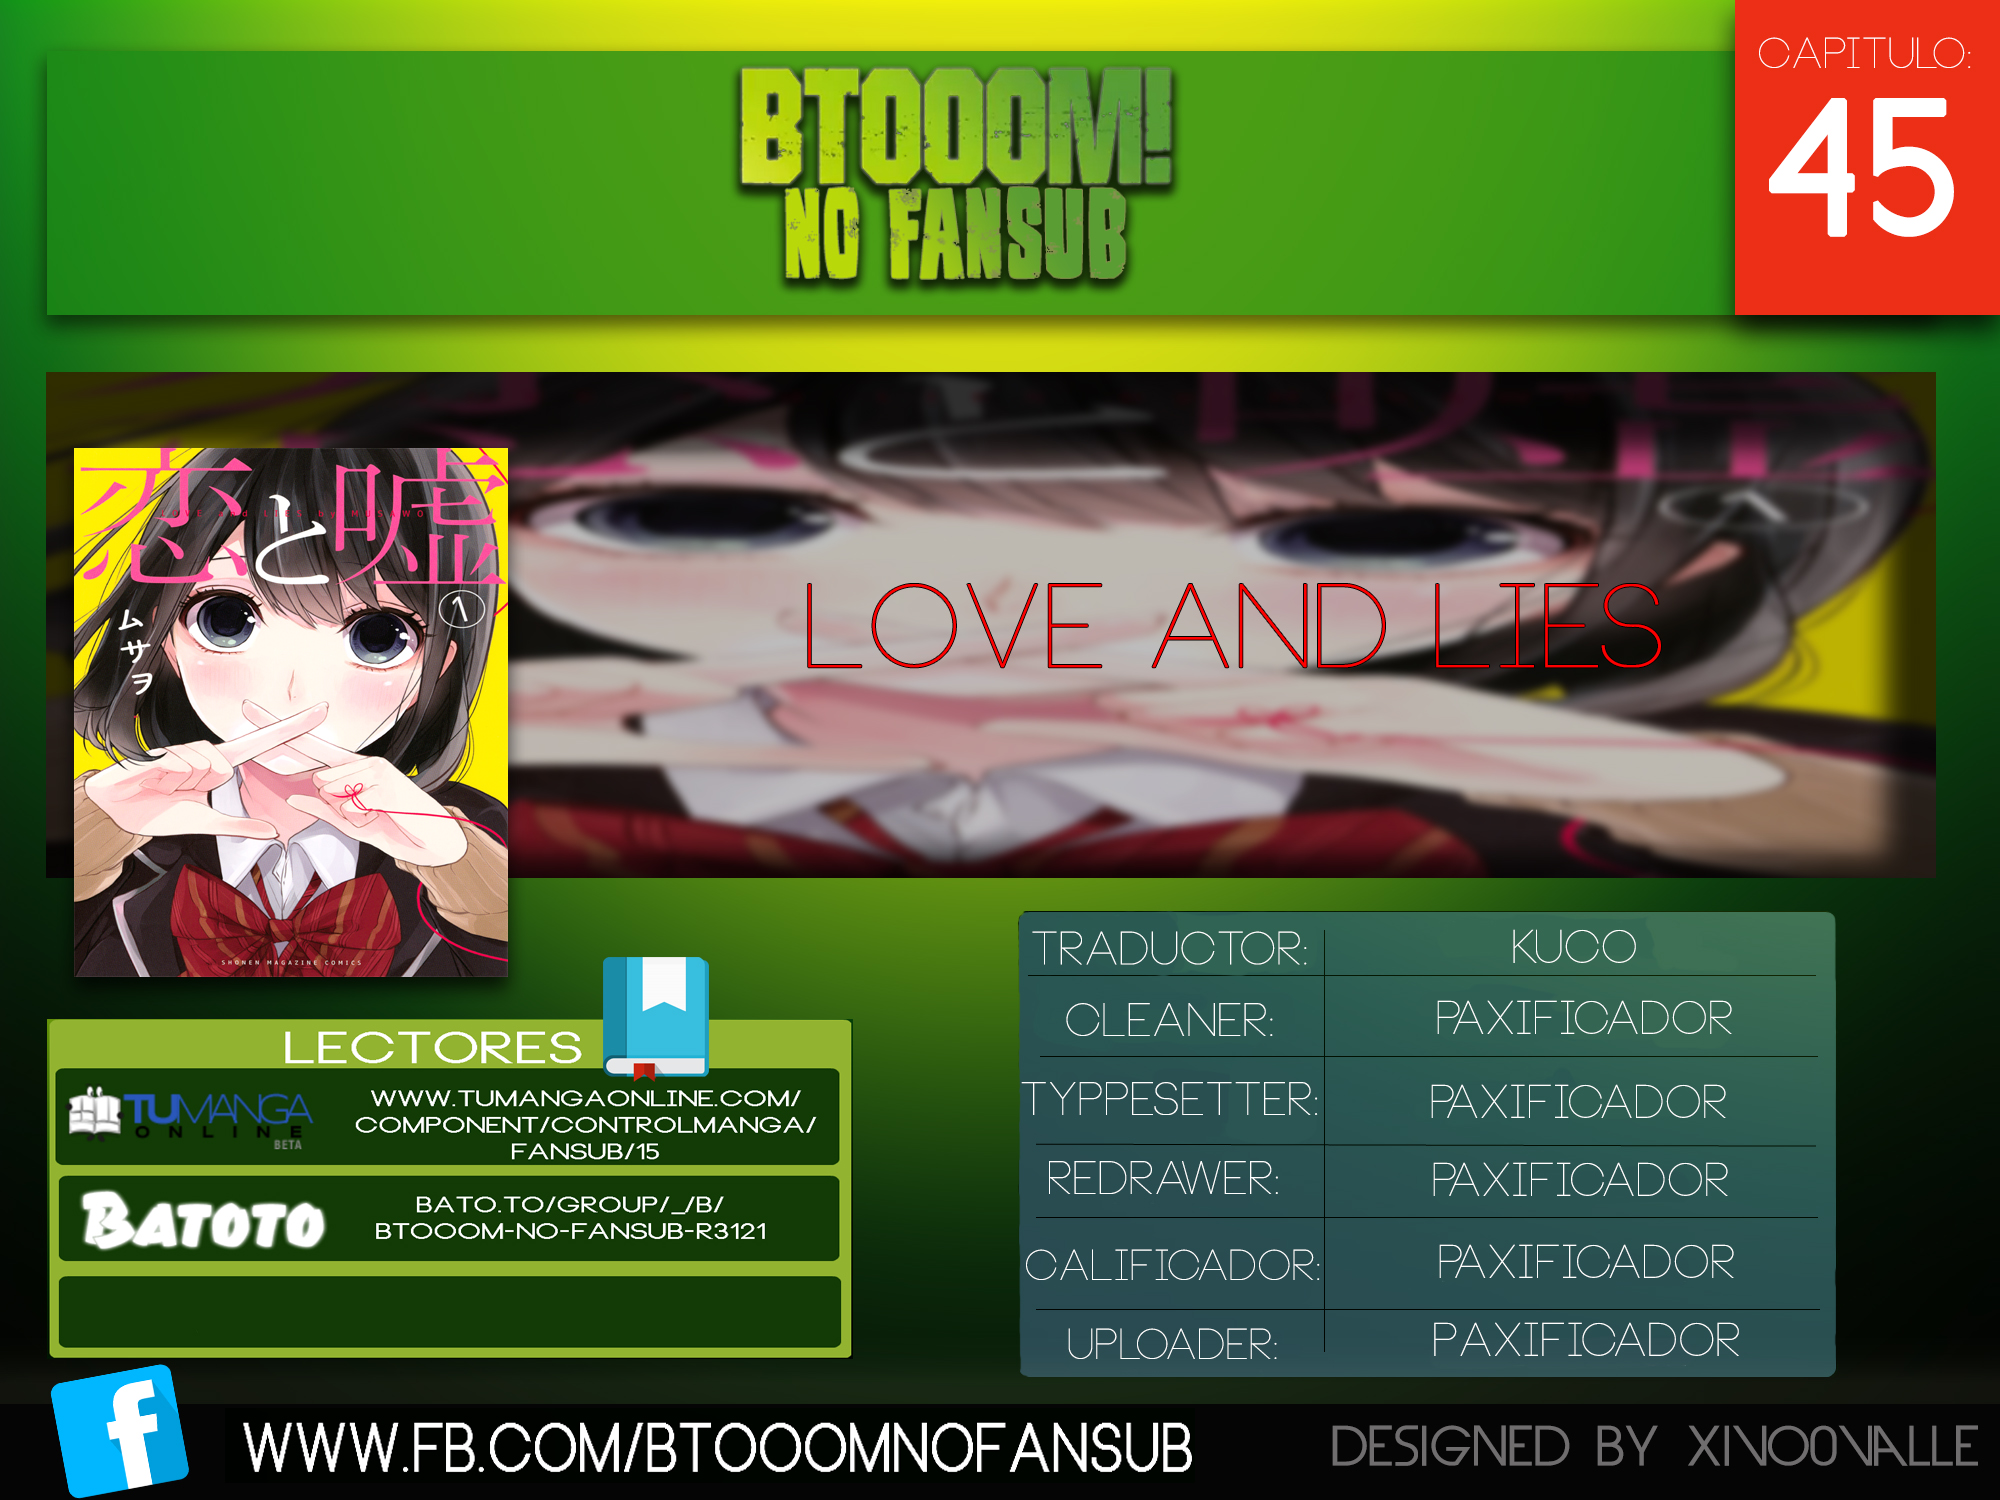 http://c5.ninemanga.com/es_manga/14/14734/392911/cd18a34bed9d904c92481e3afc767089.jpg Page 1